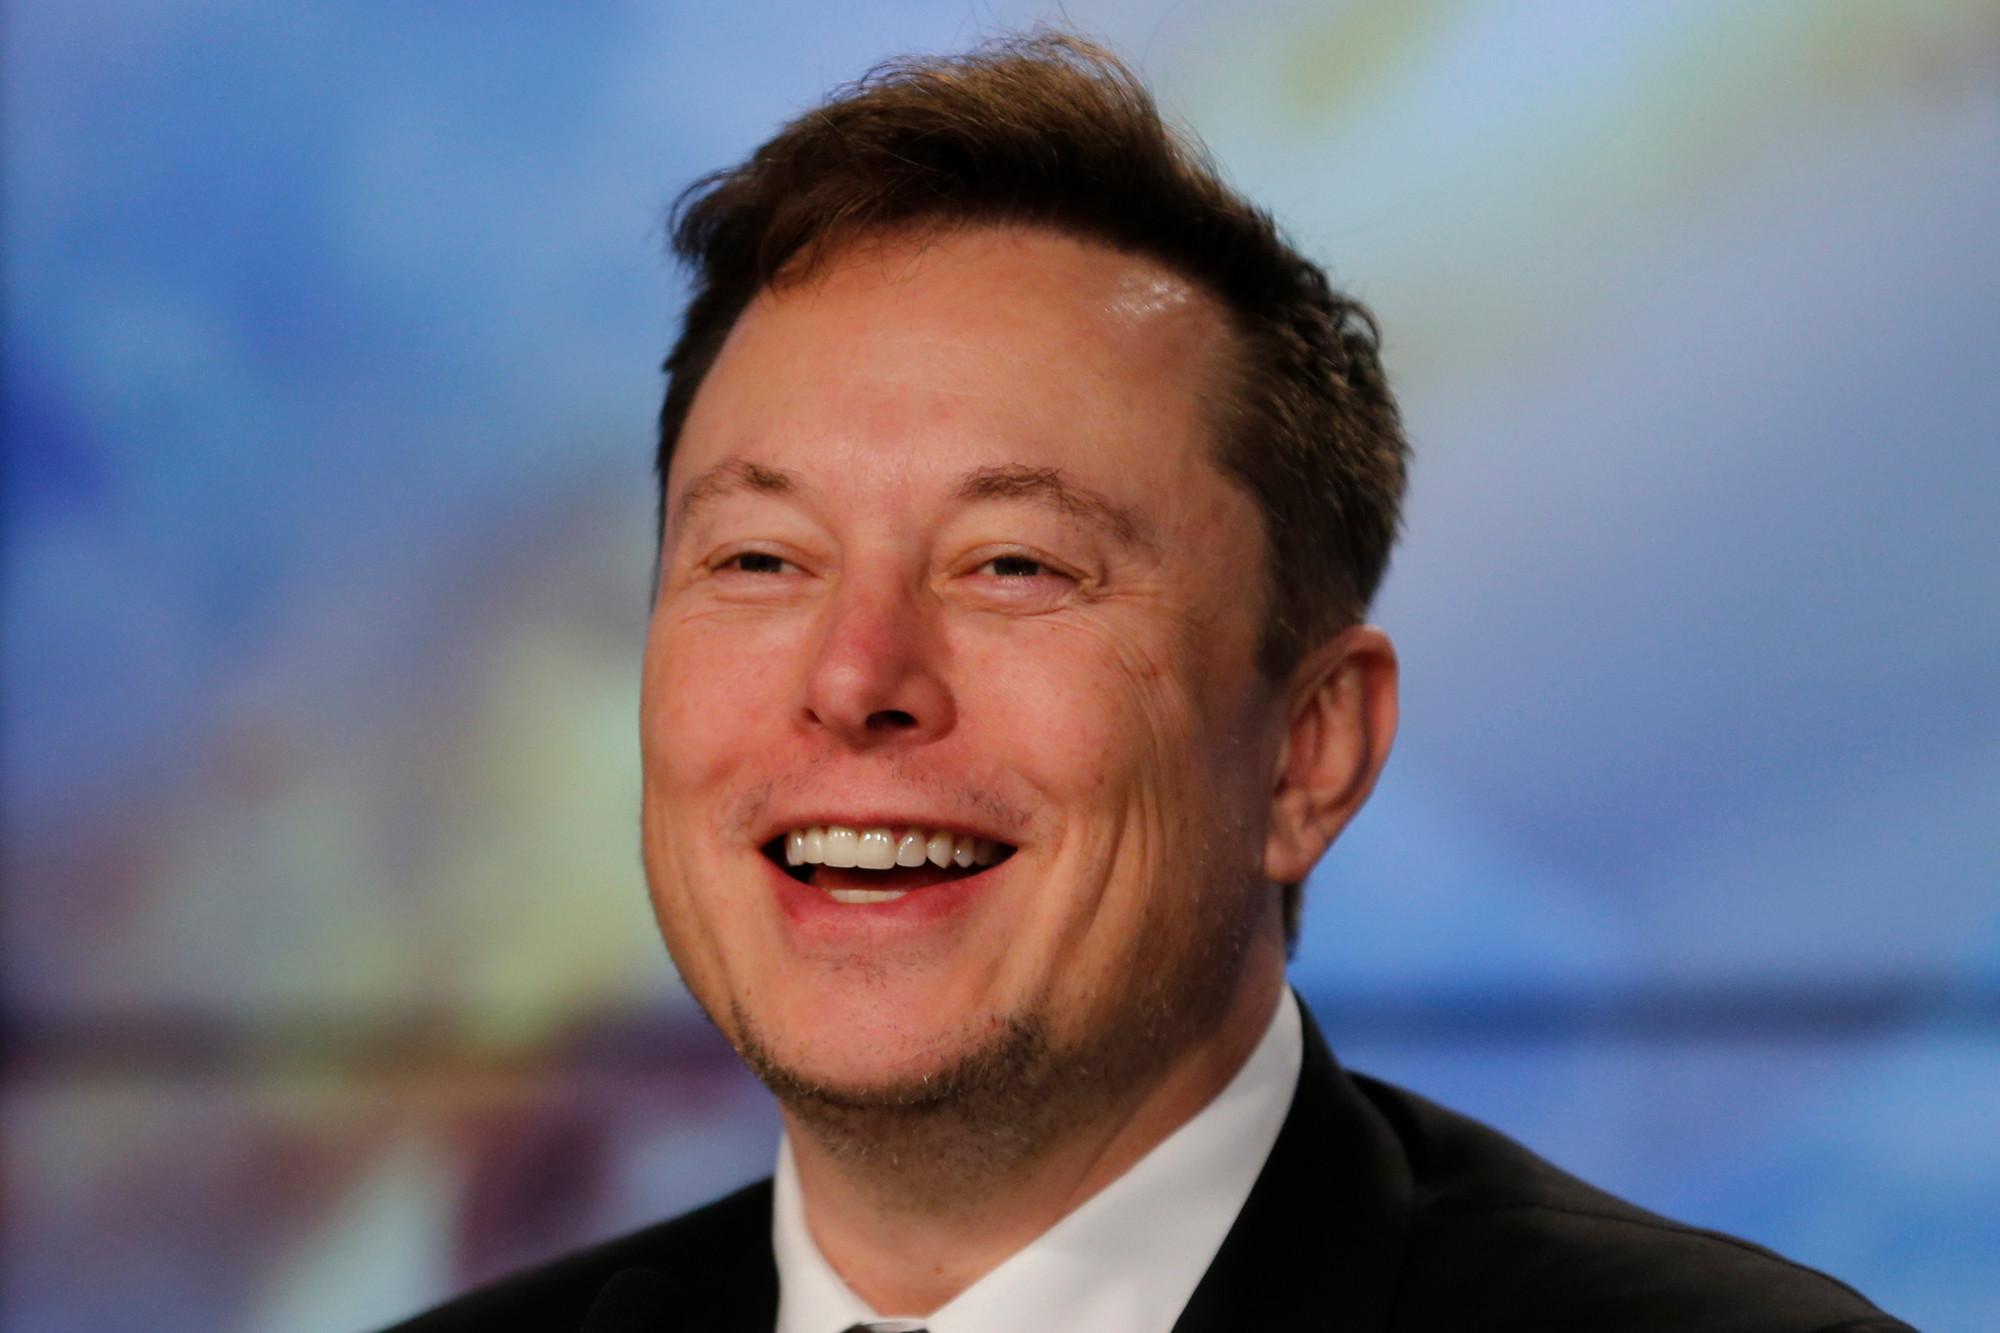 Elon Musk calls for regulations on artificial intelligence – New York Post